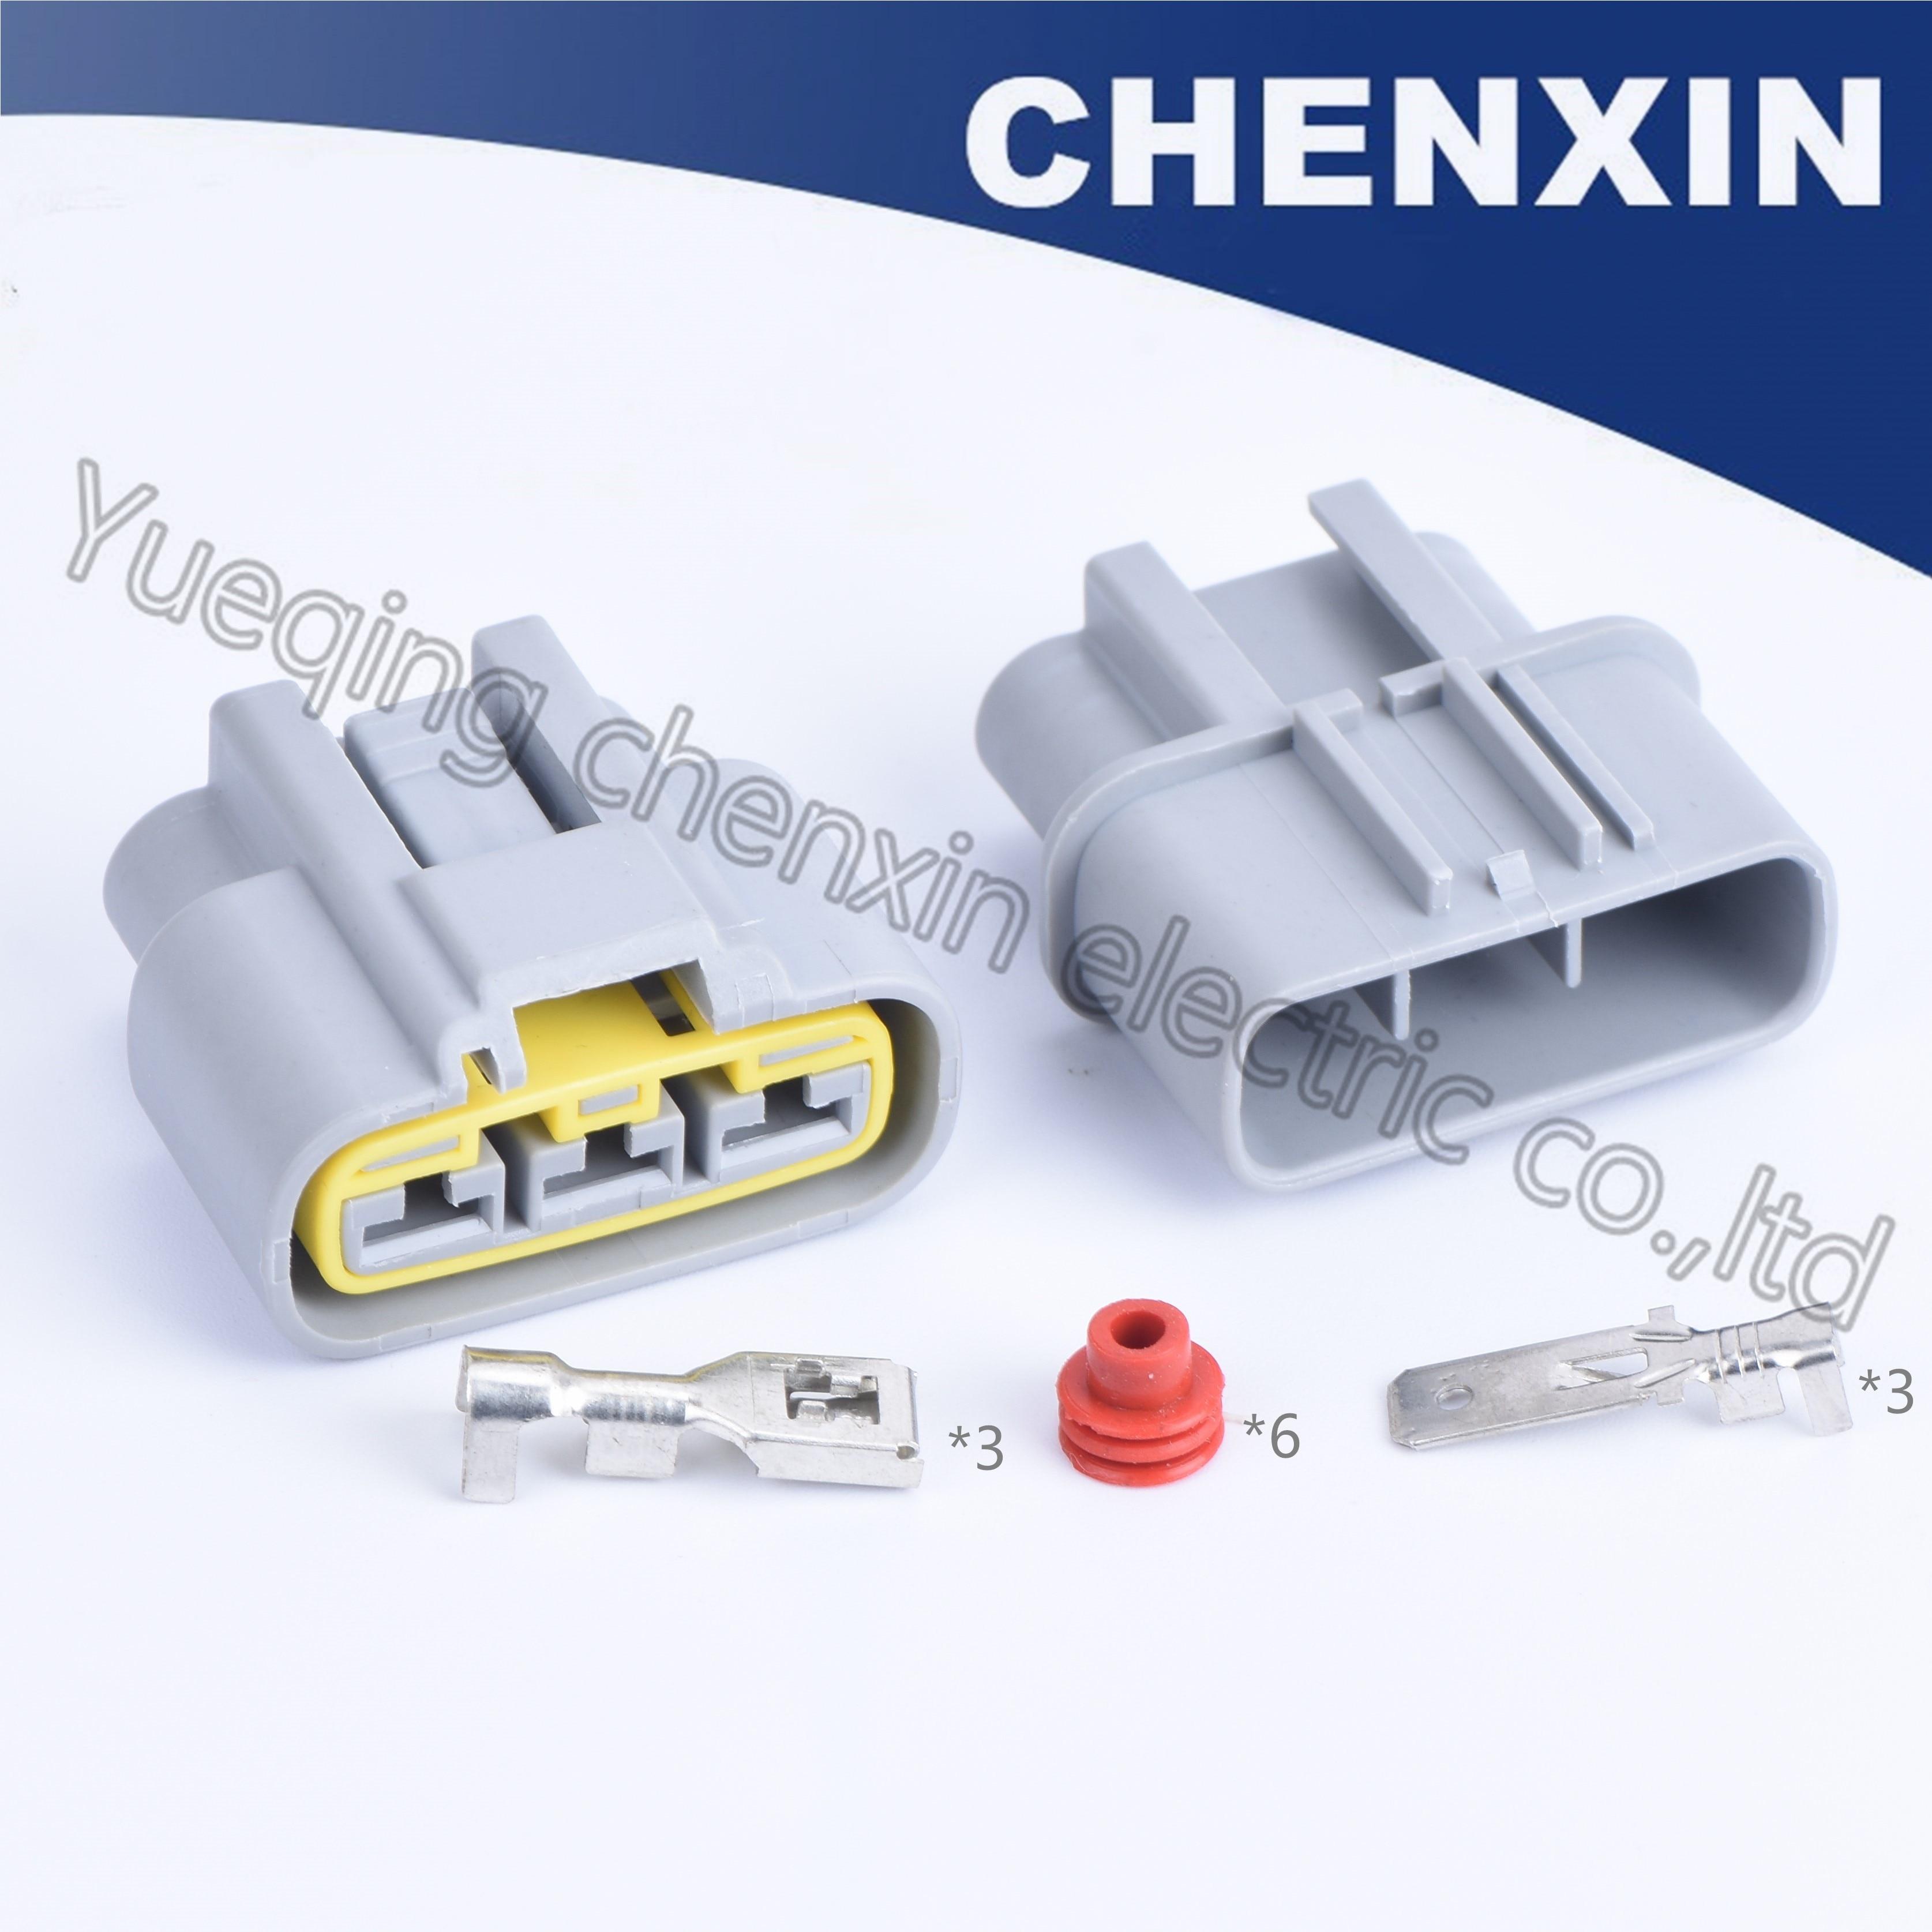 Grey 3pin car waterproof auto wiring harness connector(6.3)male and female  automobile fan socket plug QLW A 3F B QLW A 3F GR QLW|Cables, Adapters &  Sockets| - AliExpressAliExpress